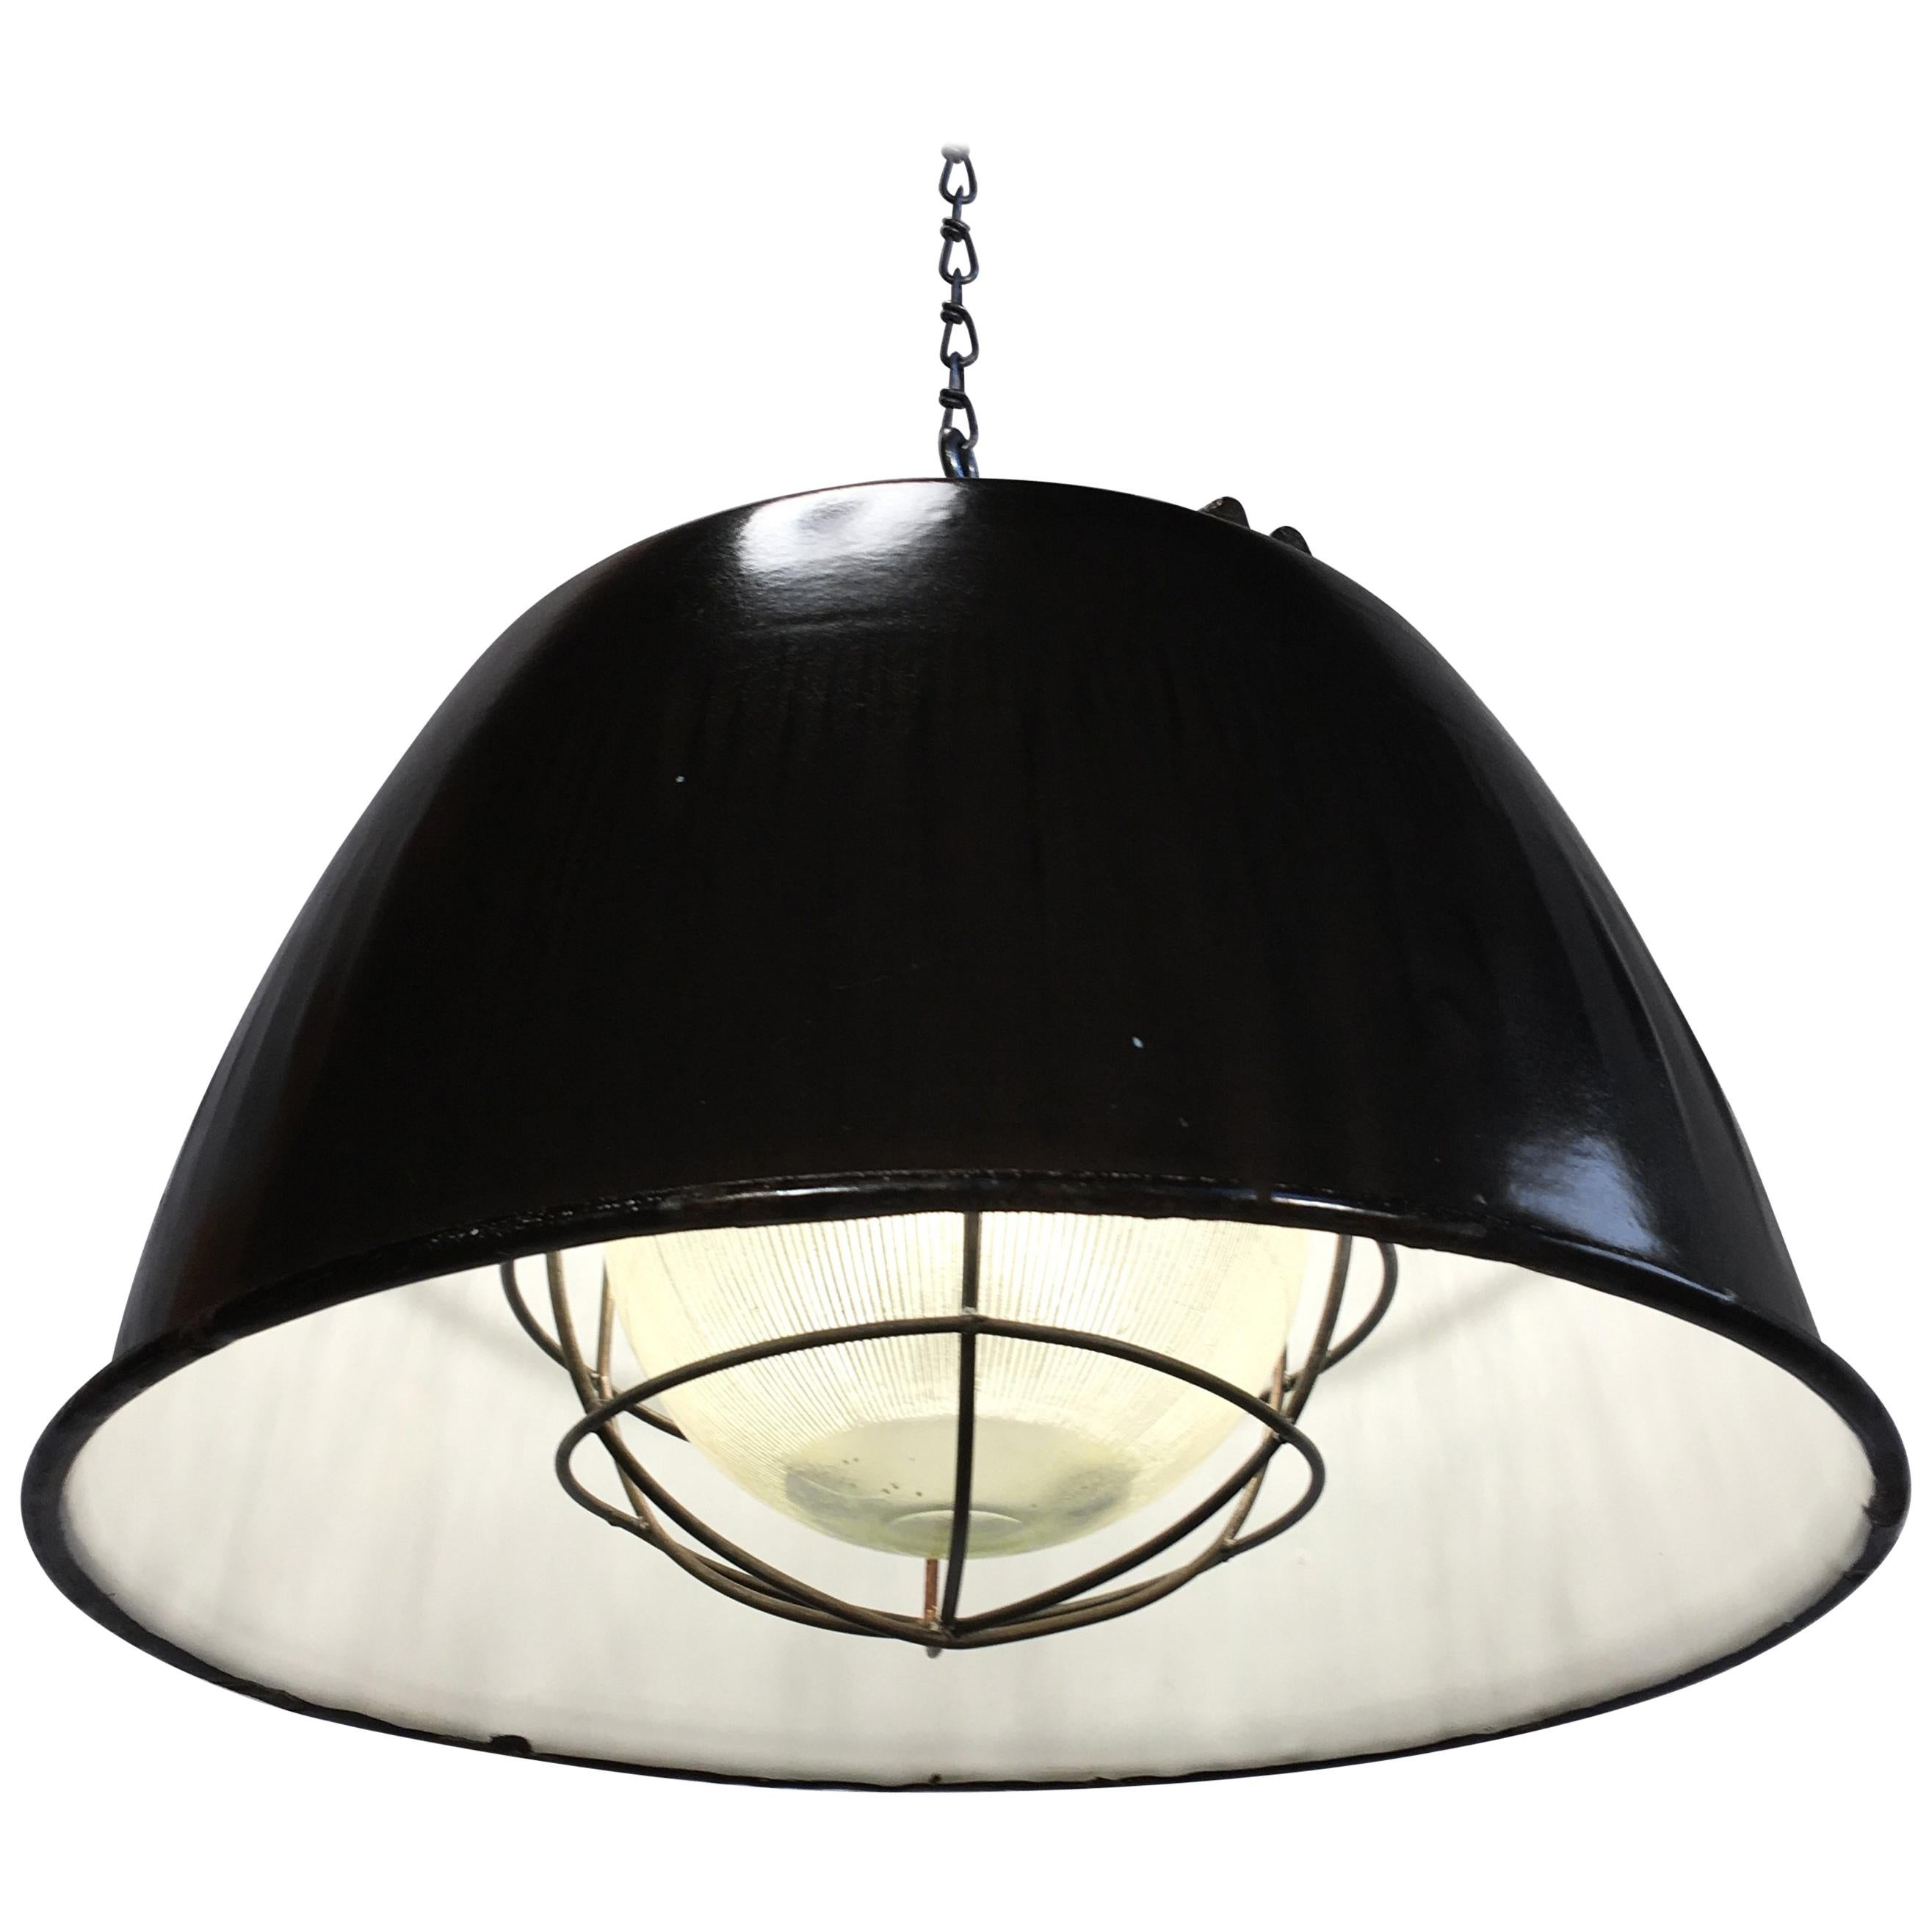 Vintage Industrial Factory Pendant Light, Black Enamel Shade Cast Iron Top